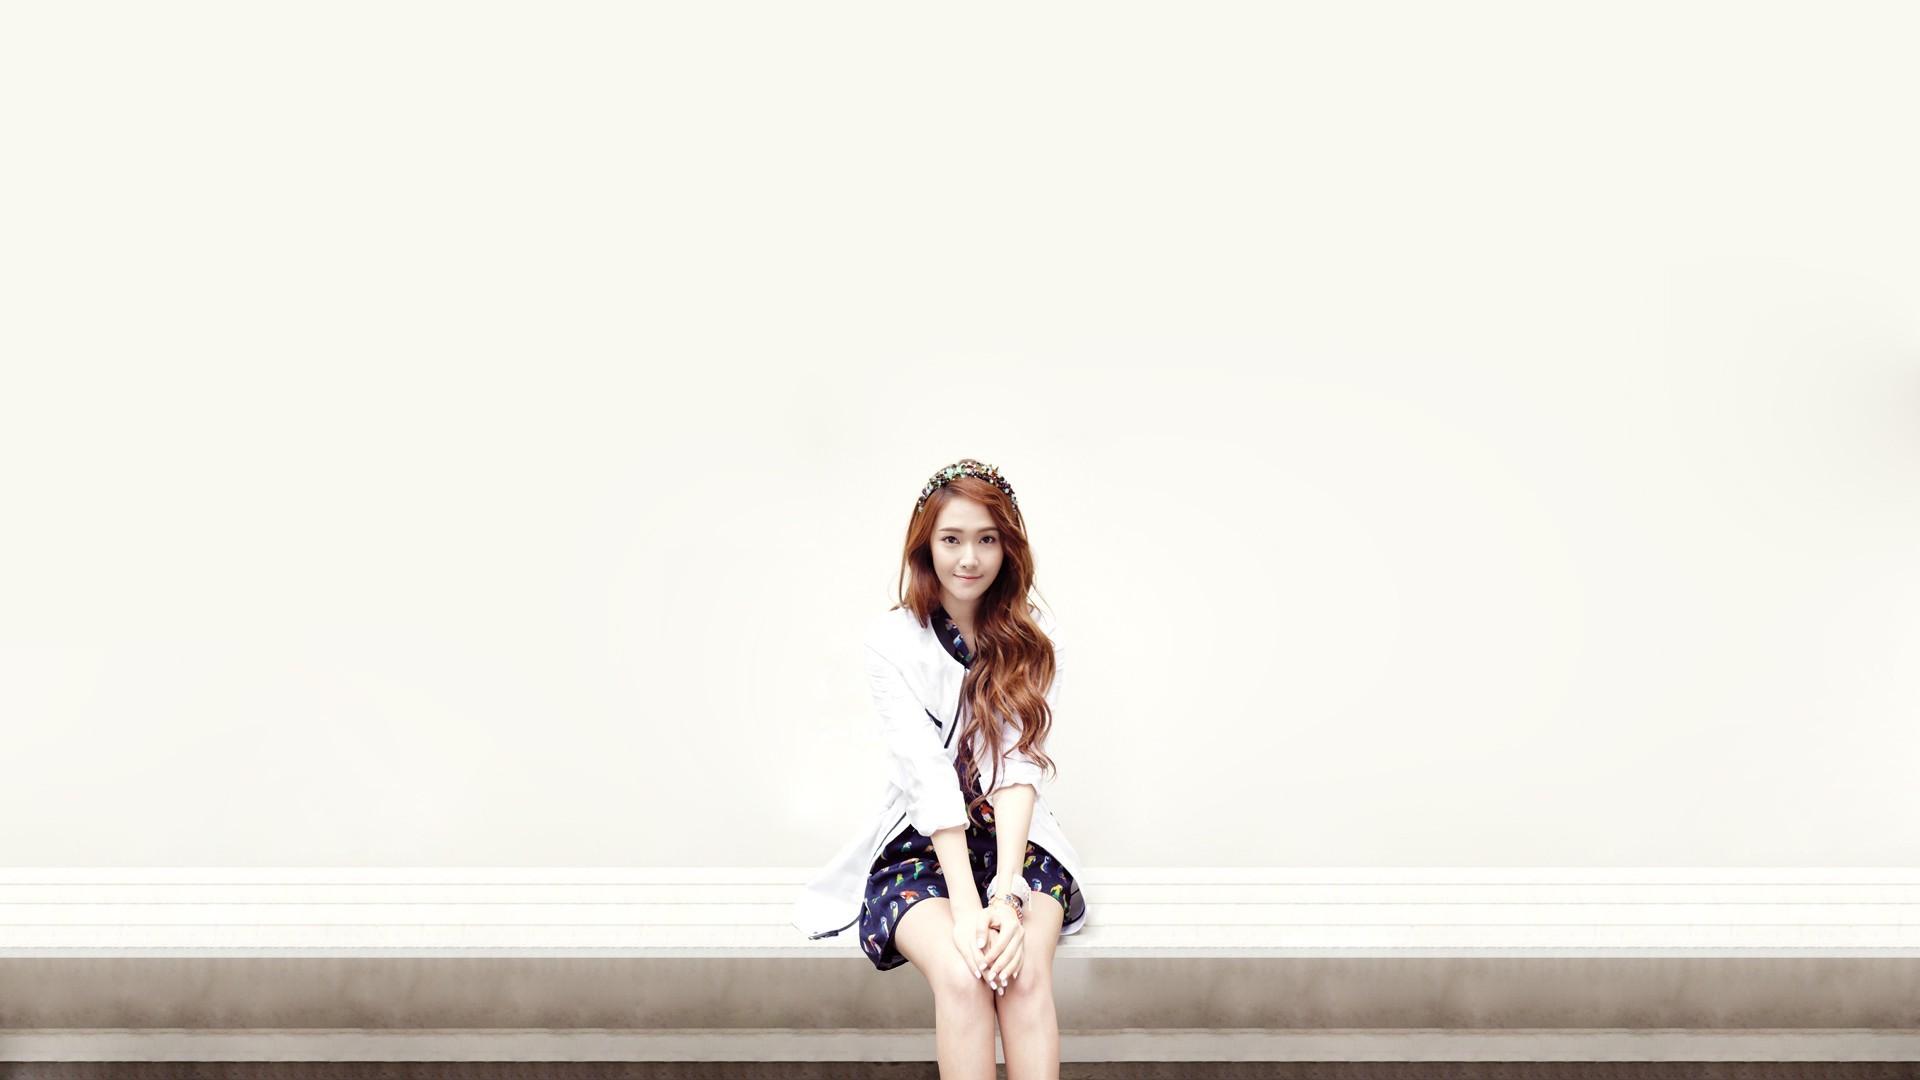 jessica jung snsd girls generation k pop wallpaper and background 1920x1080